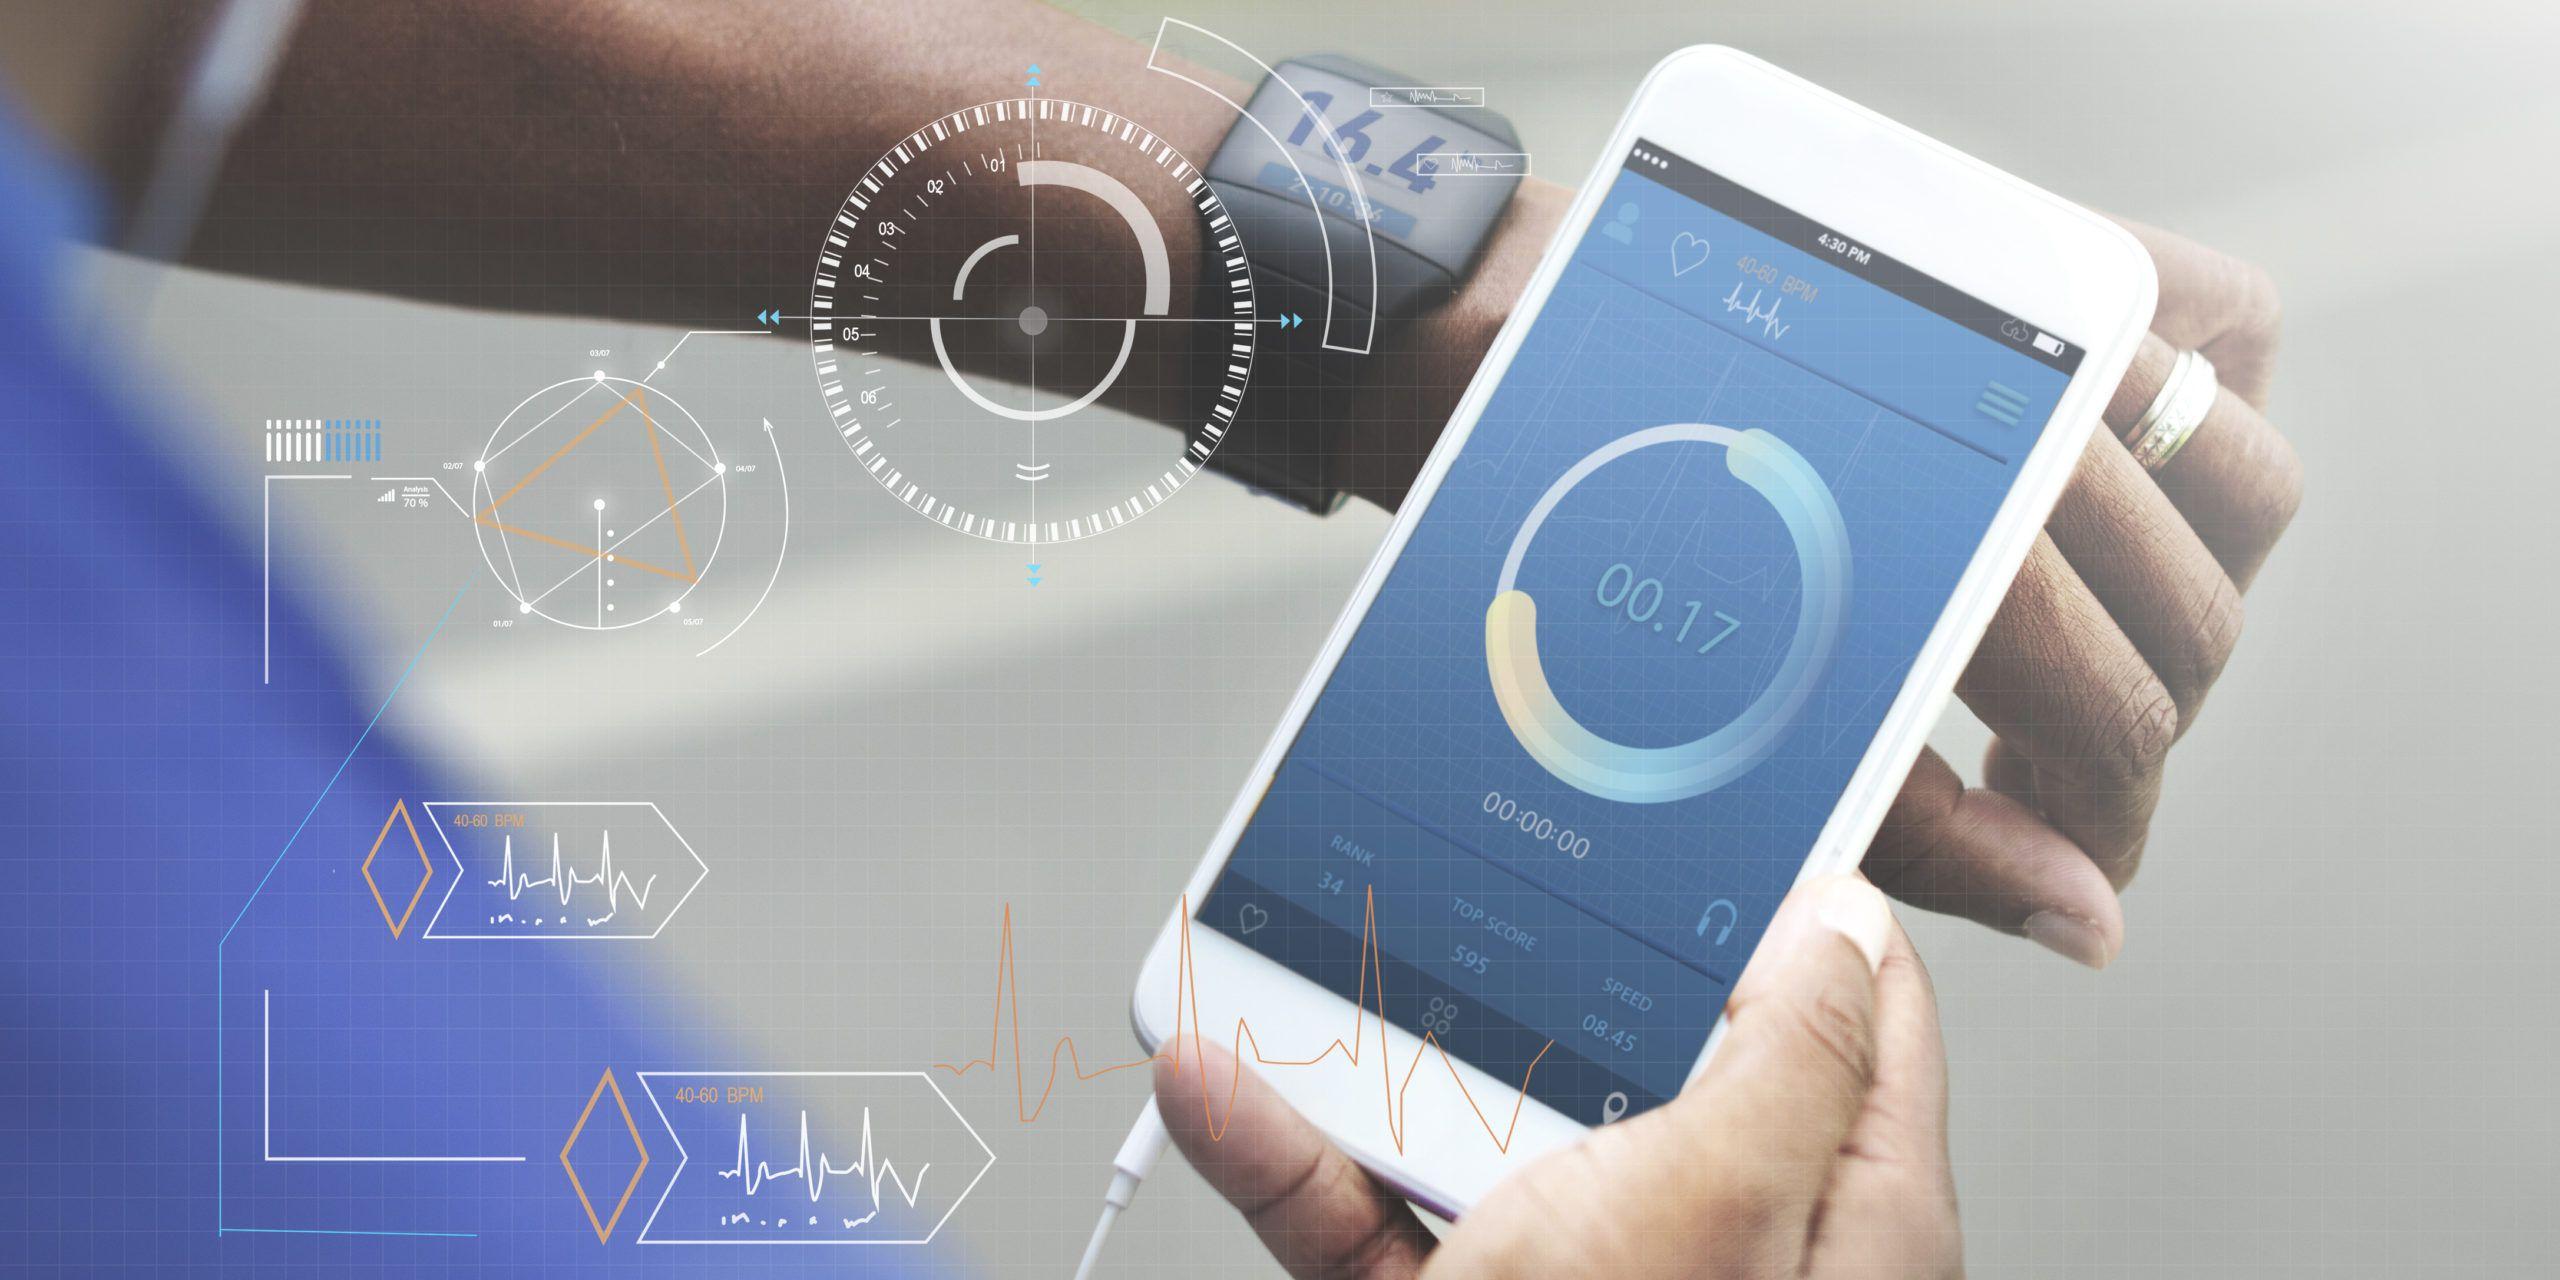 Fitness Tech Healthcare Wellness Innovation Concept